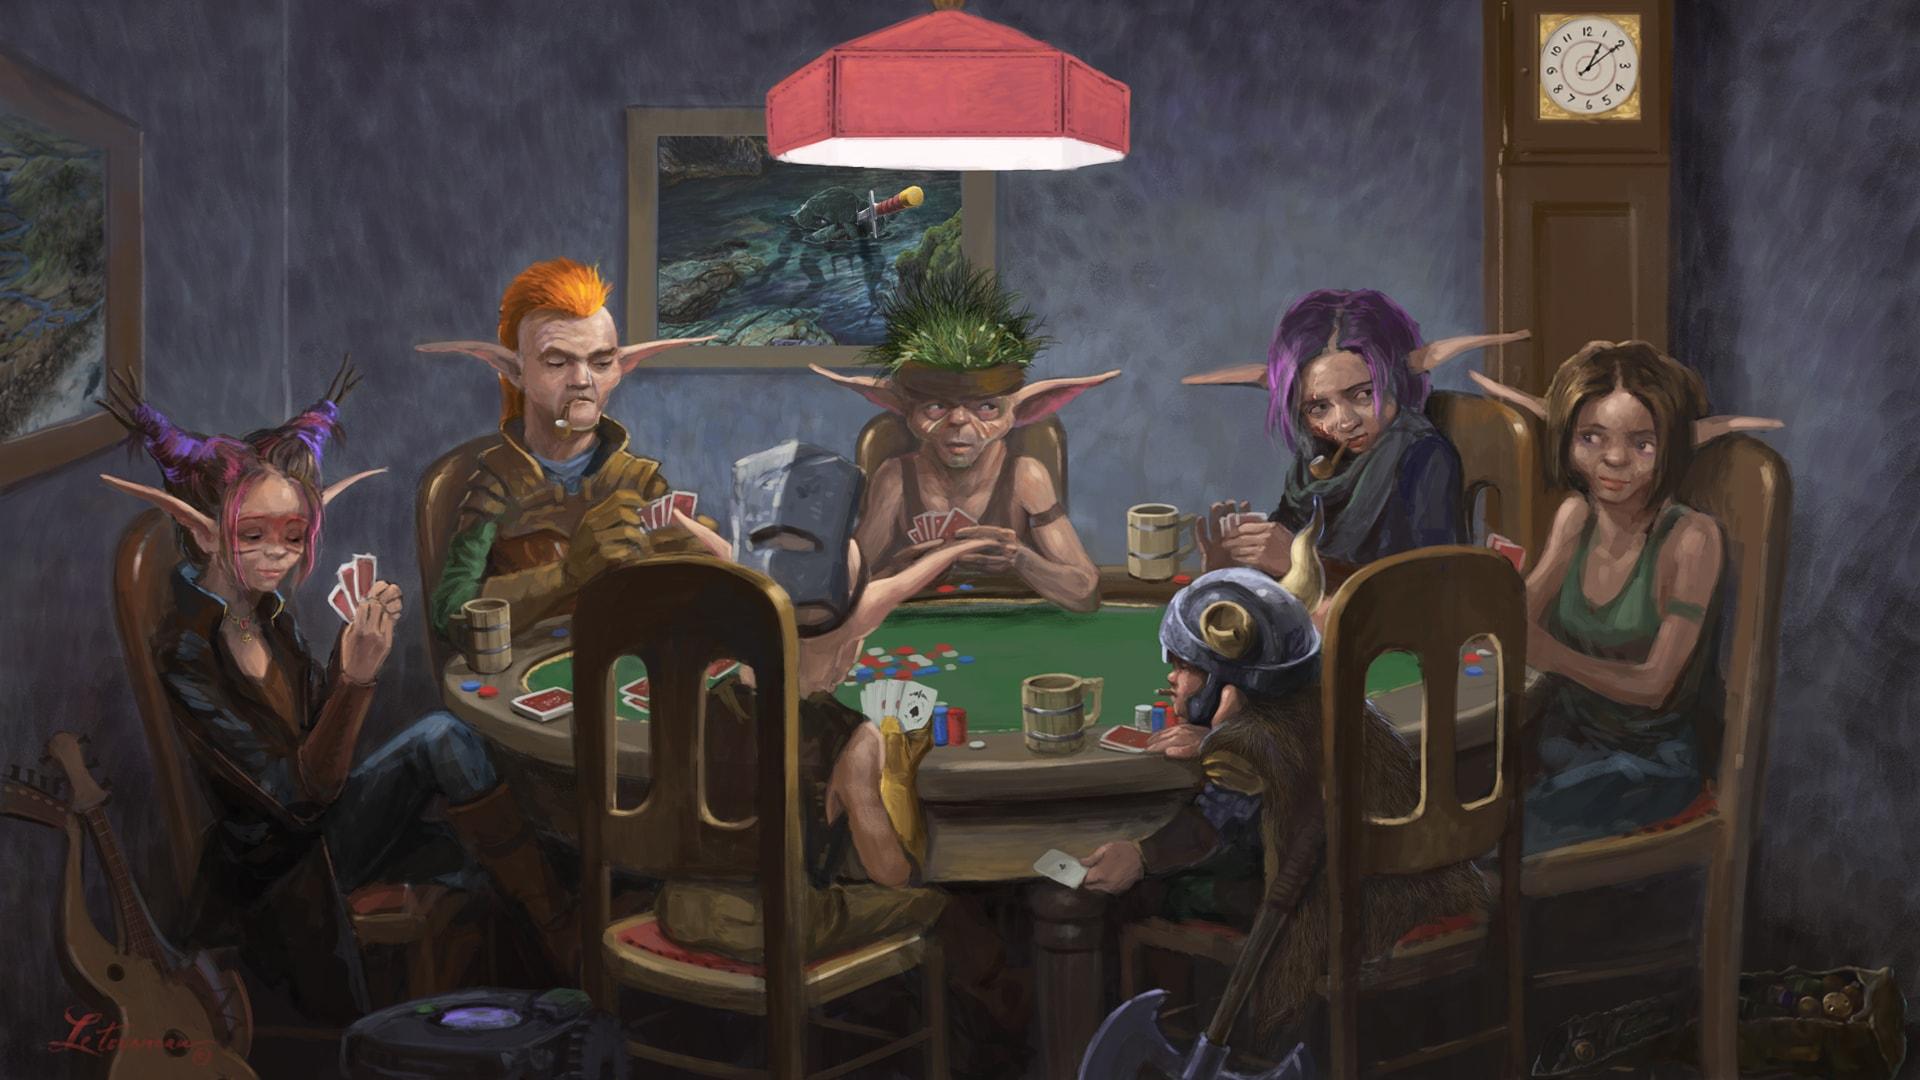 Gearlocs playing poker 1920x1080